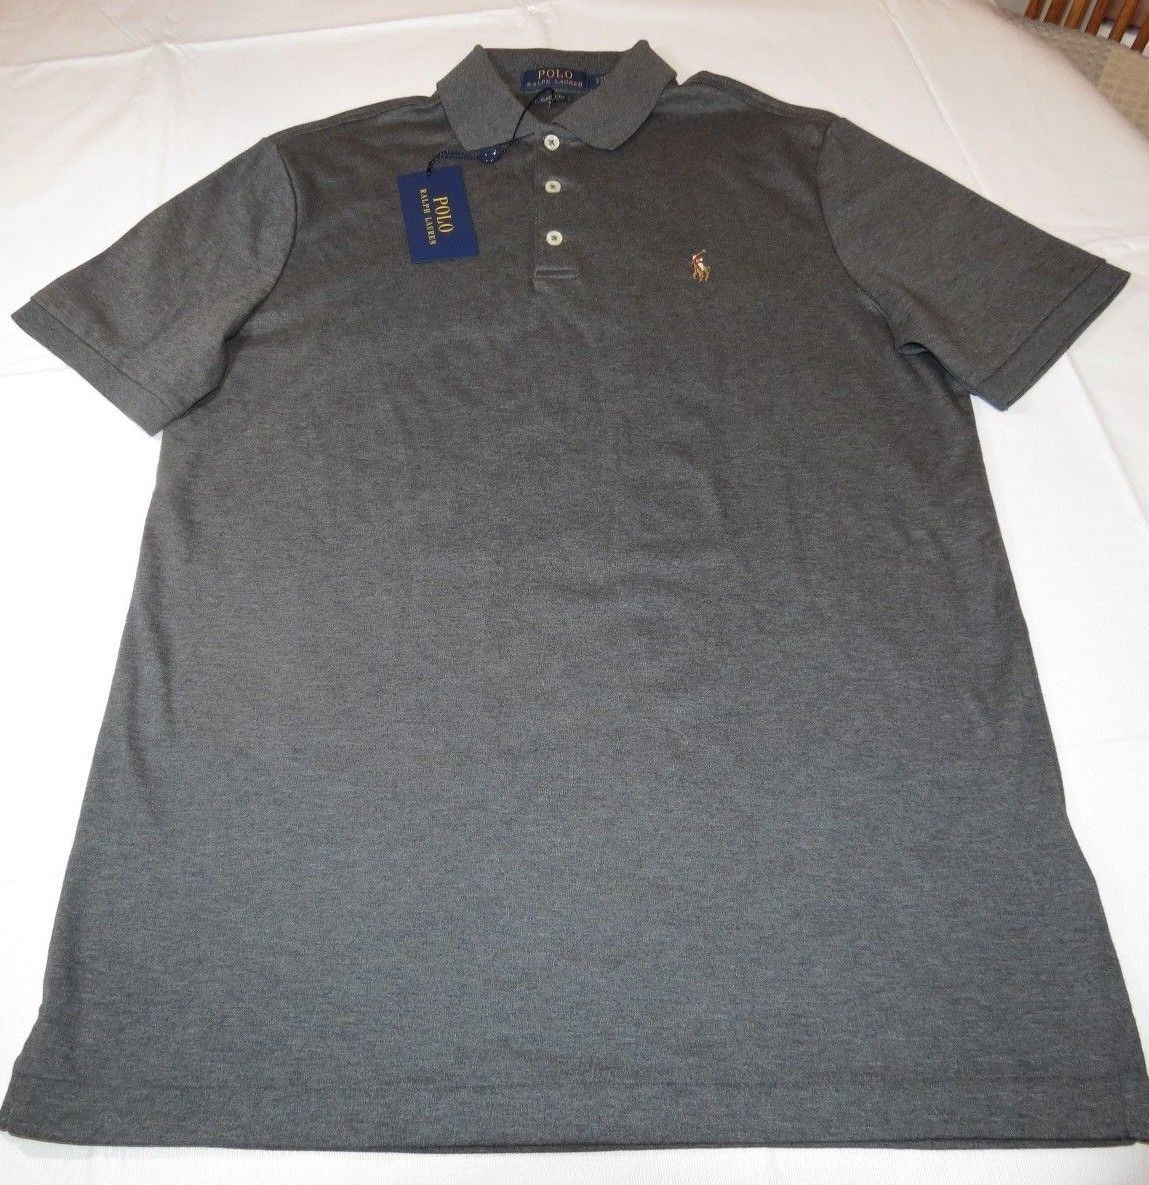 Items Ralph Short 50 Sleeve And Mens Polo Similar Lauren QthCrxsd